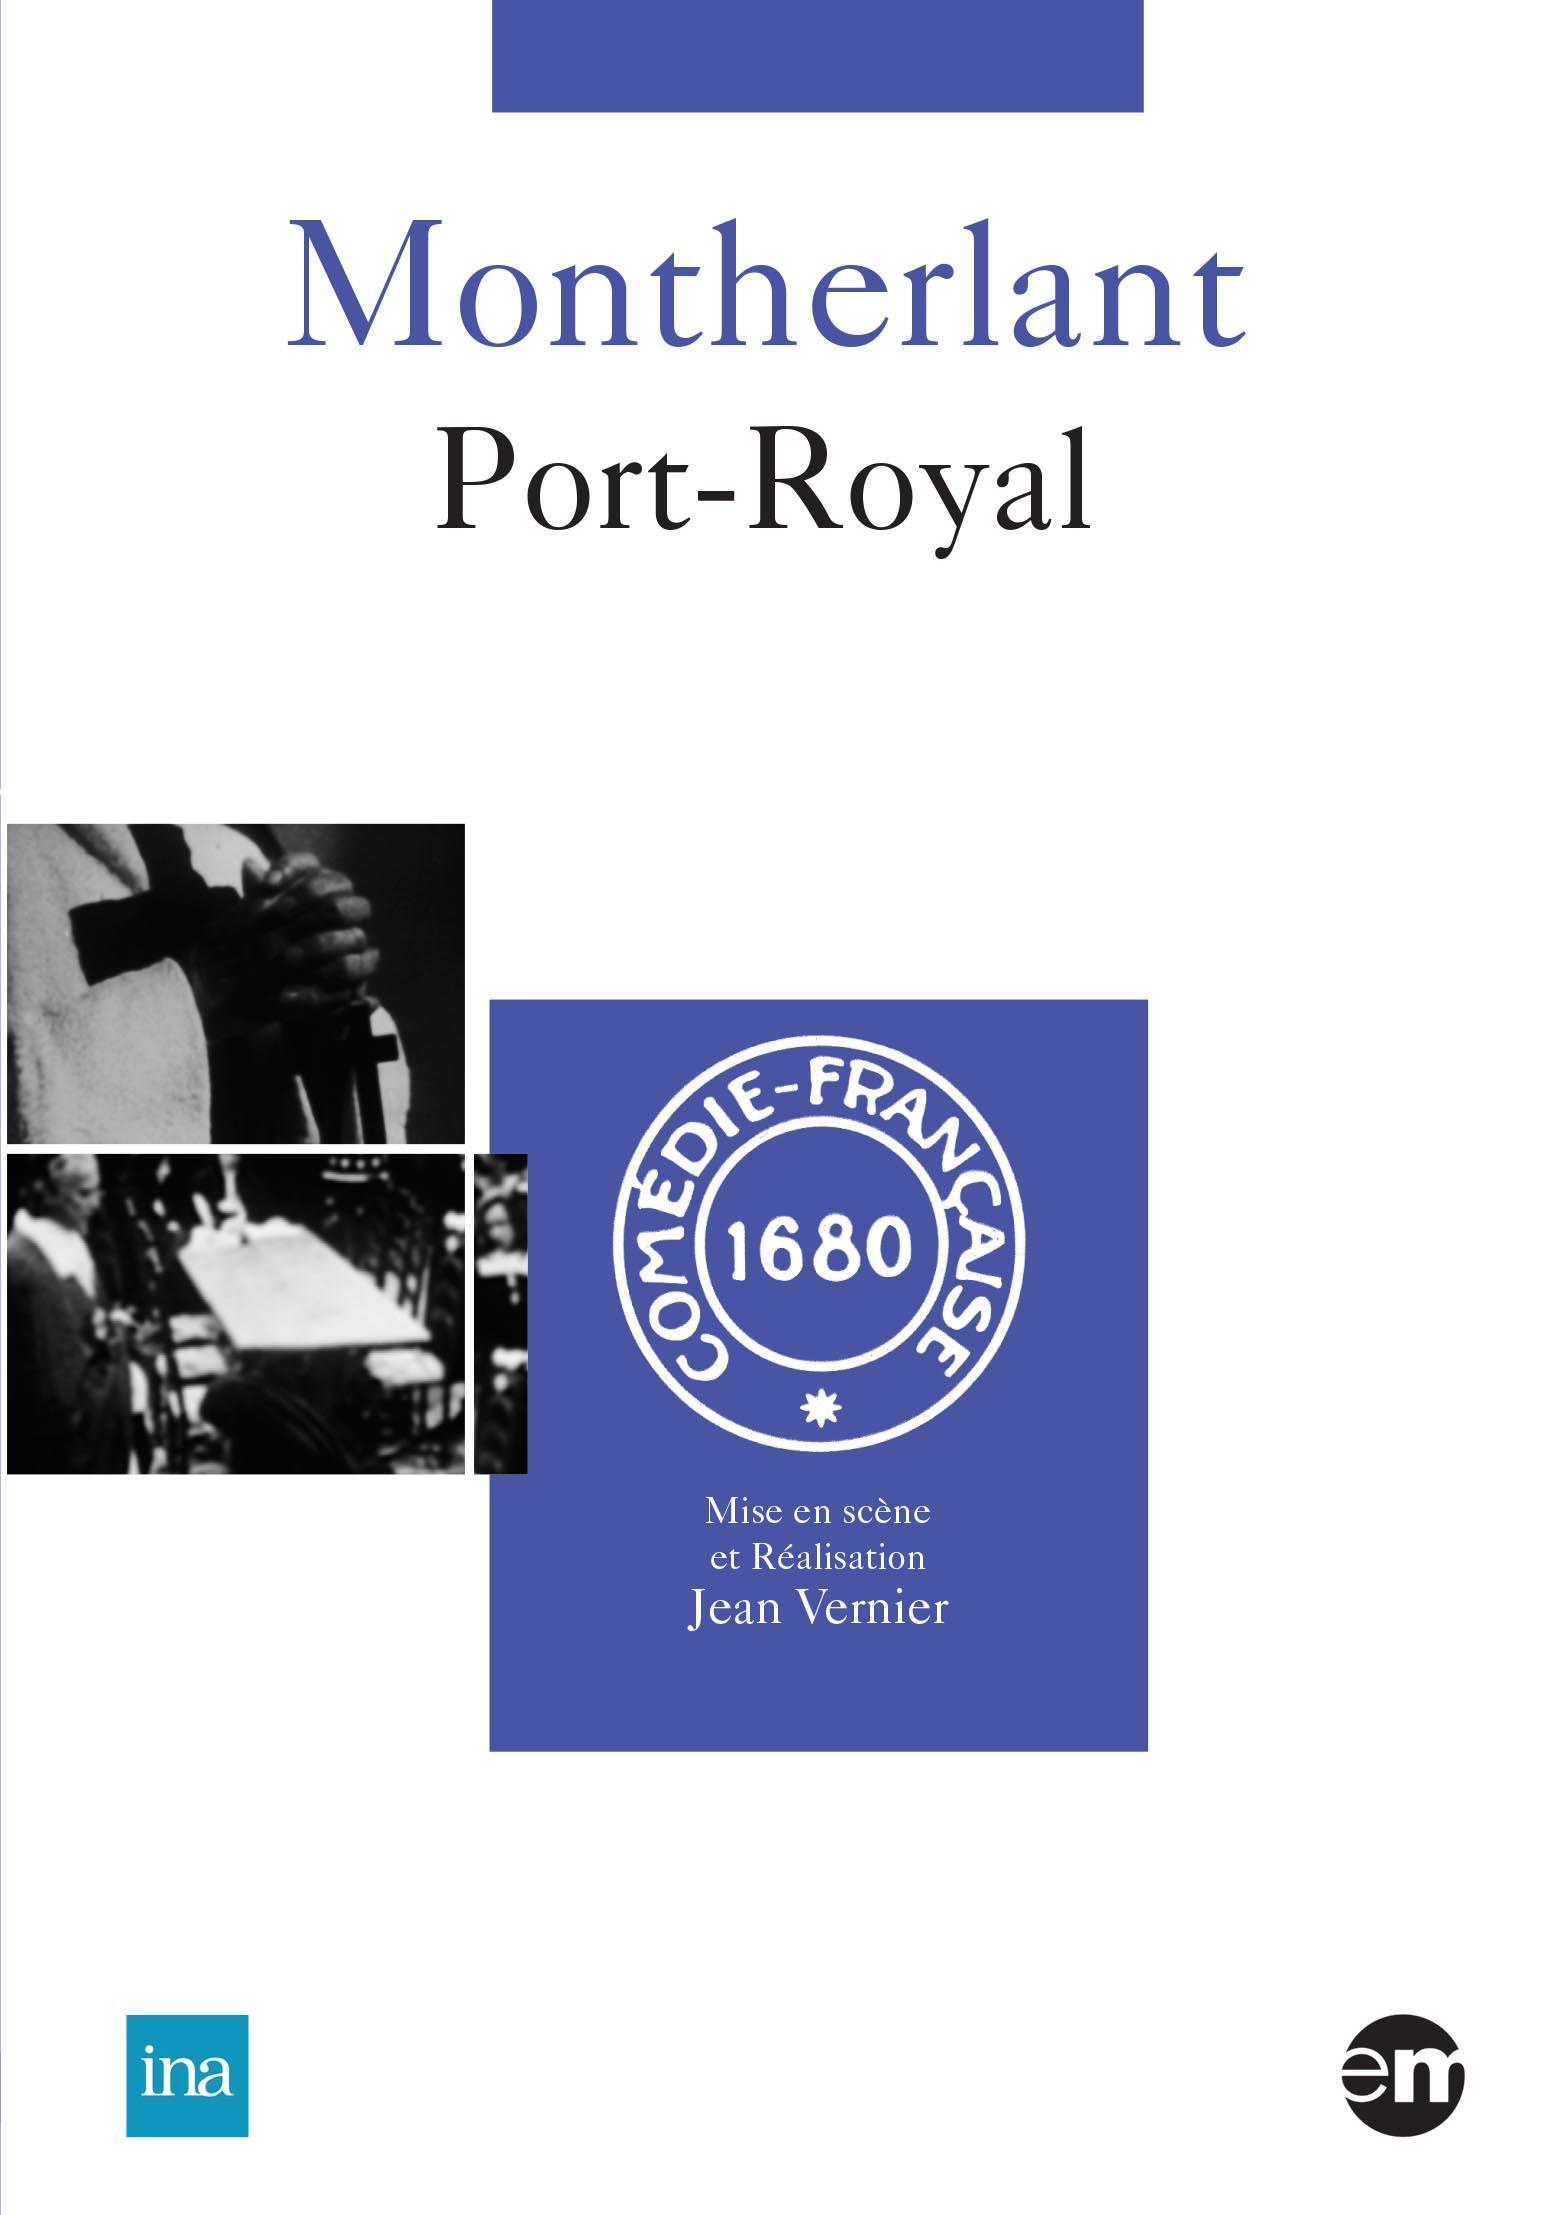 Port-royal (montherlant) - dvd